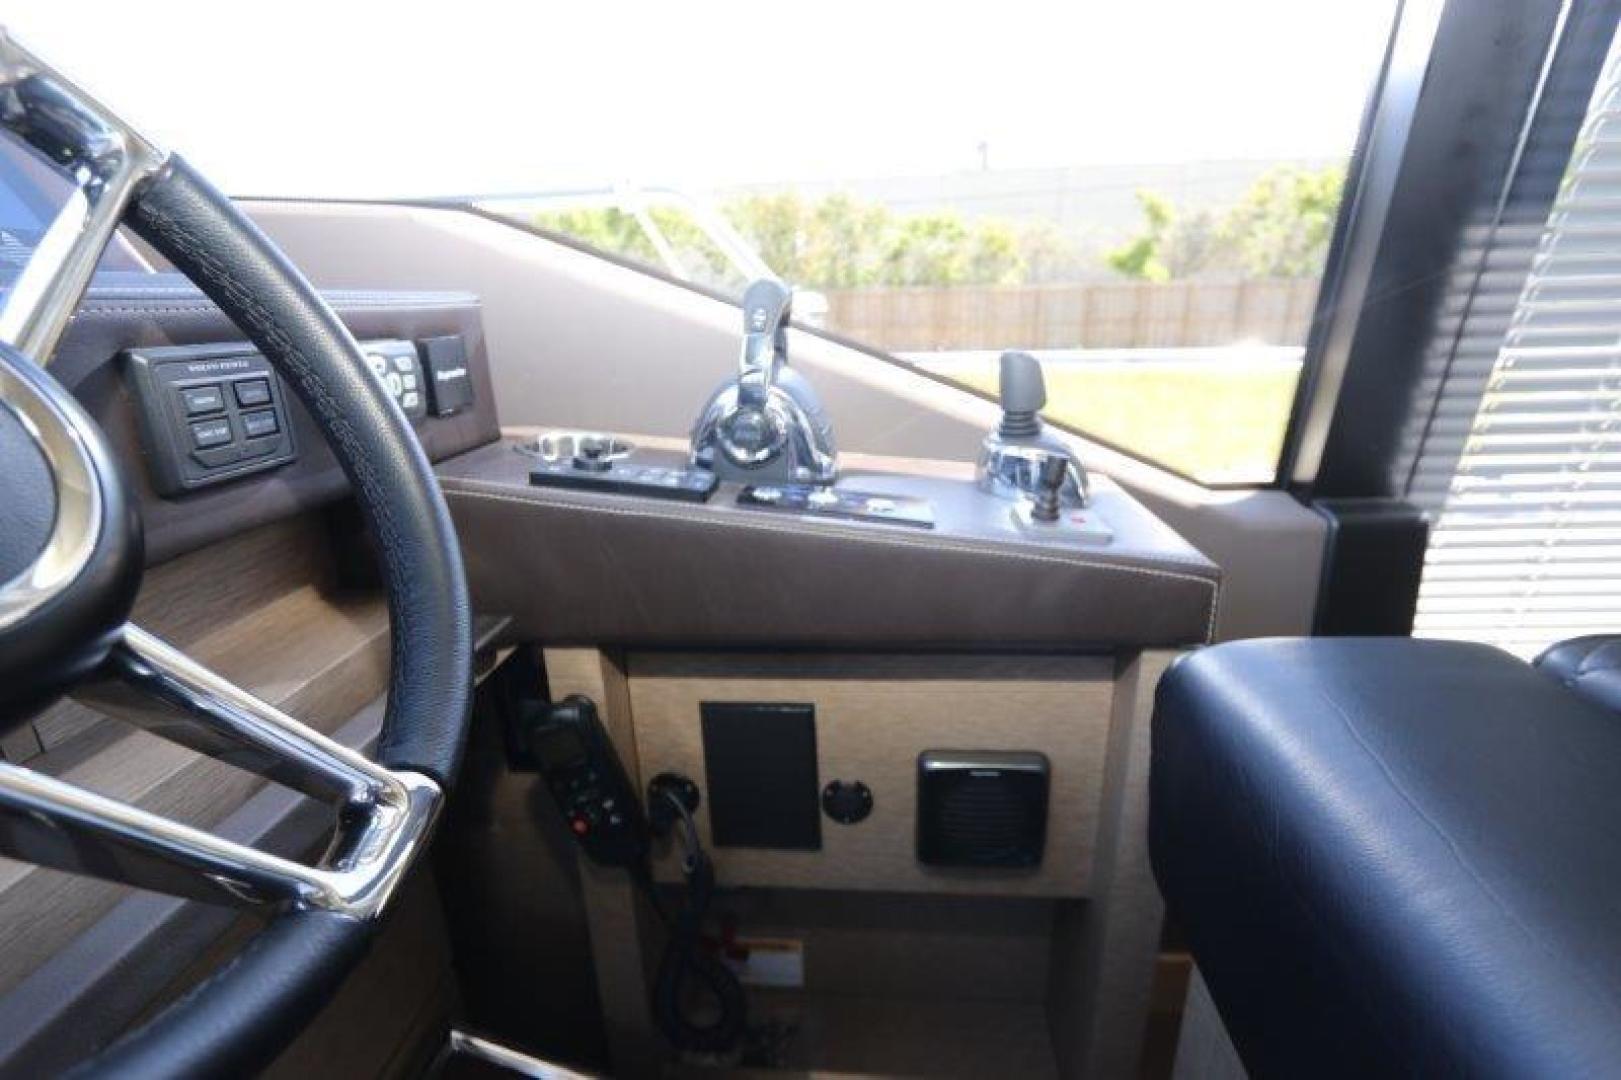 Prestige-Motoryacht 2017-Breathe Easy Fort Lauderdale-Florida-United States-1303855   Thumbnail